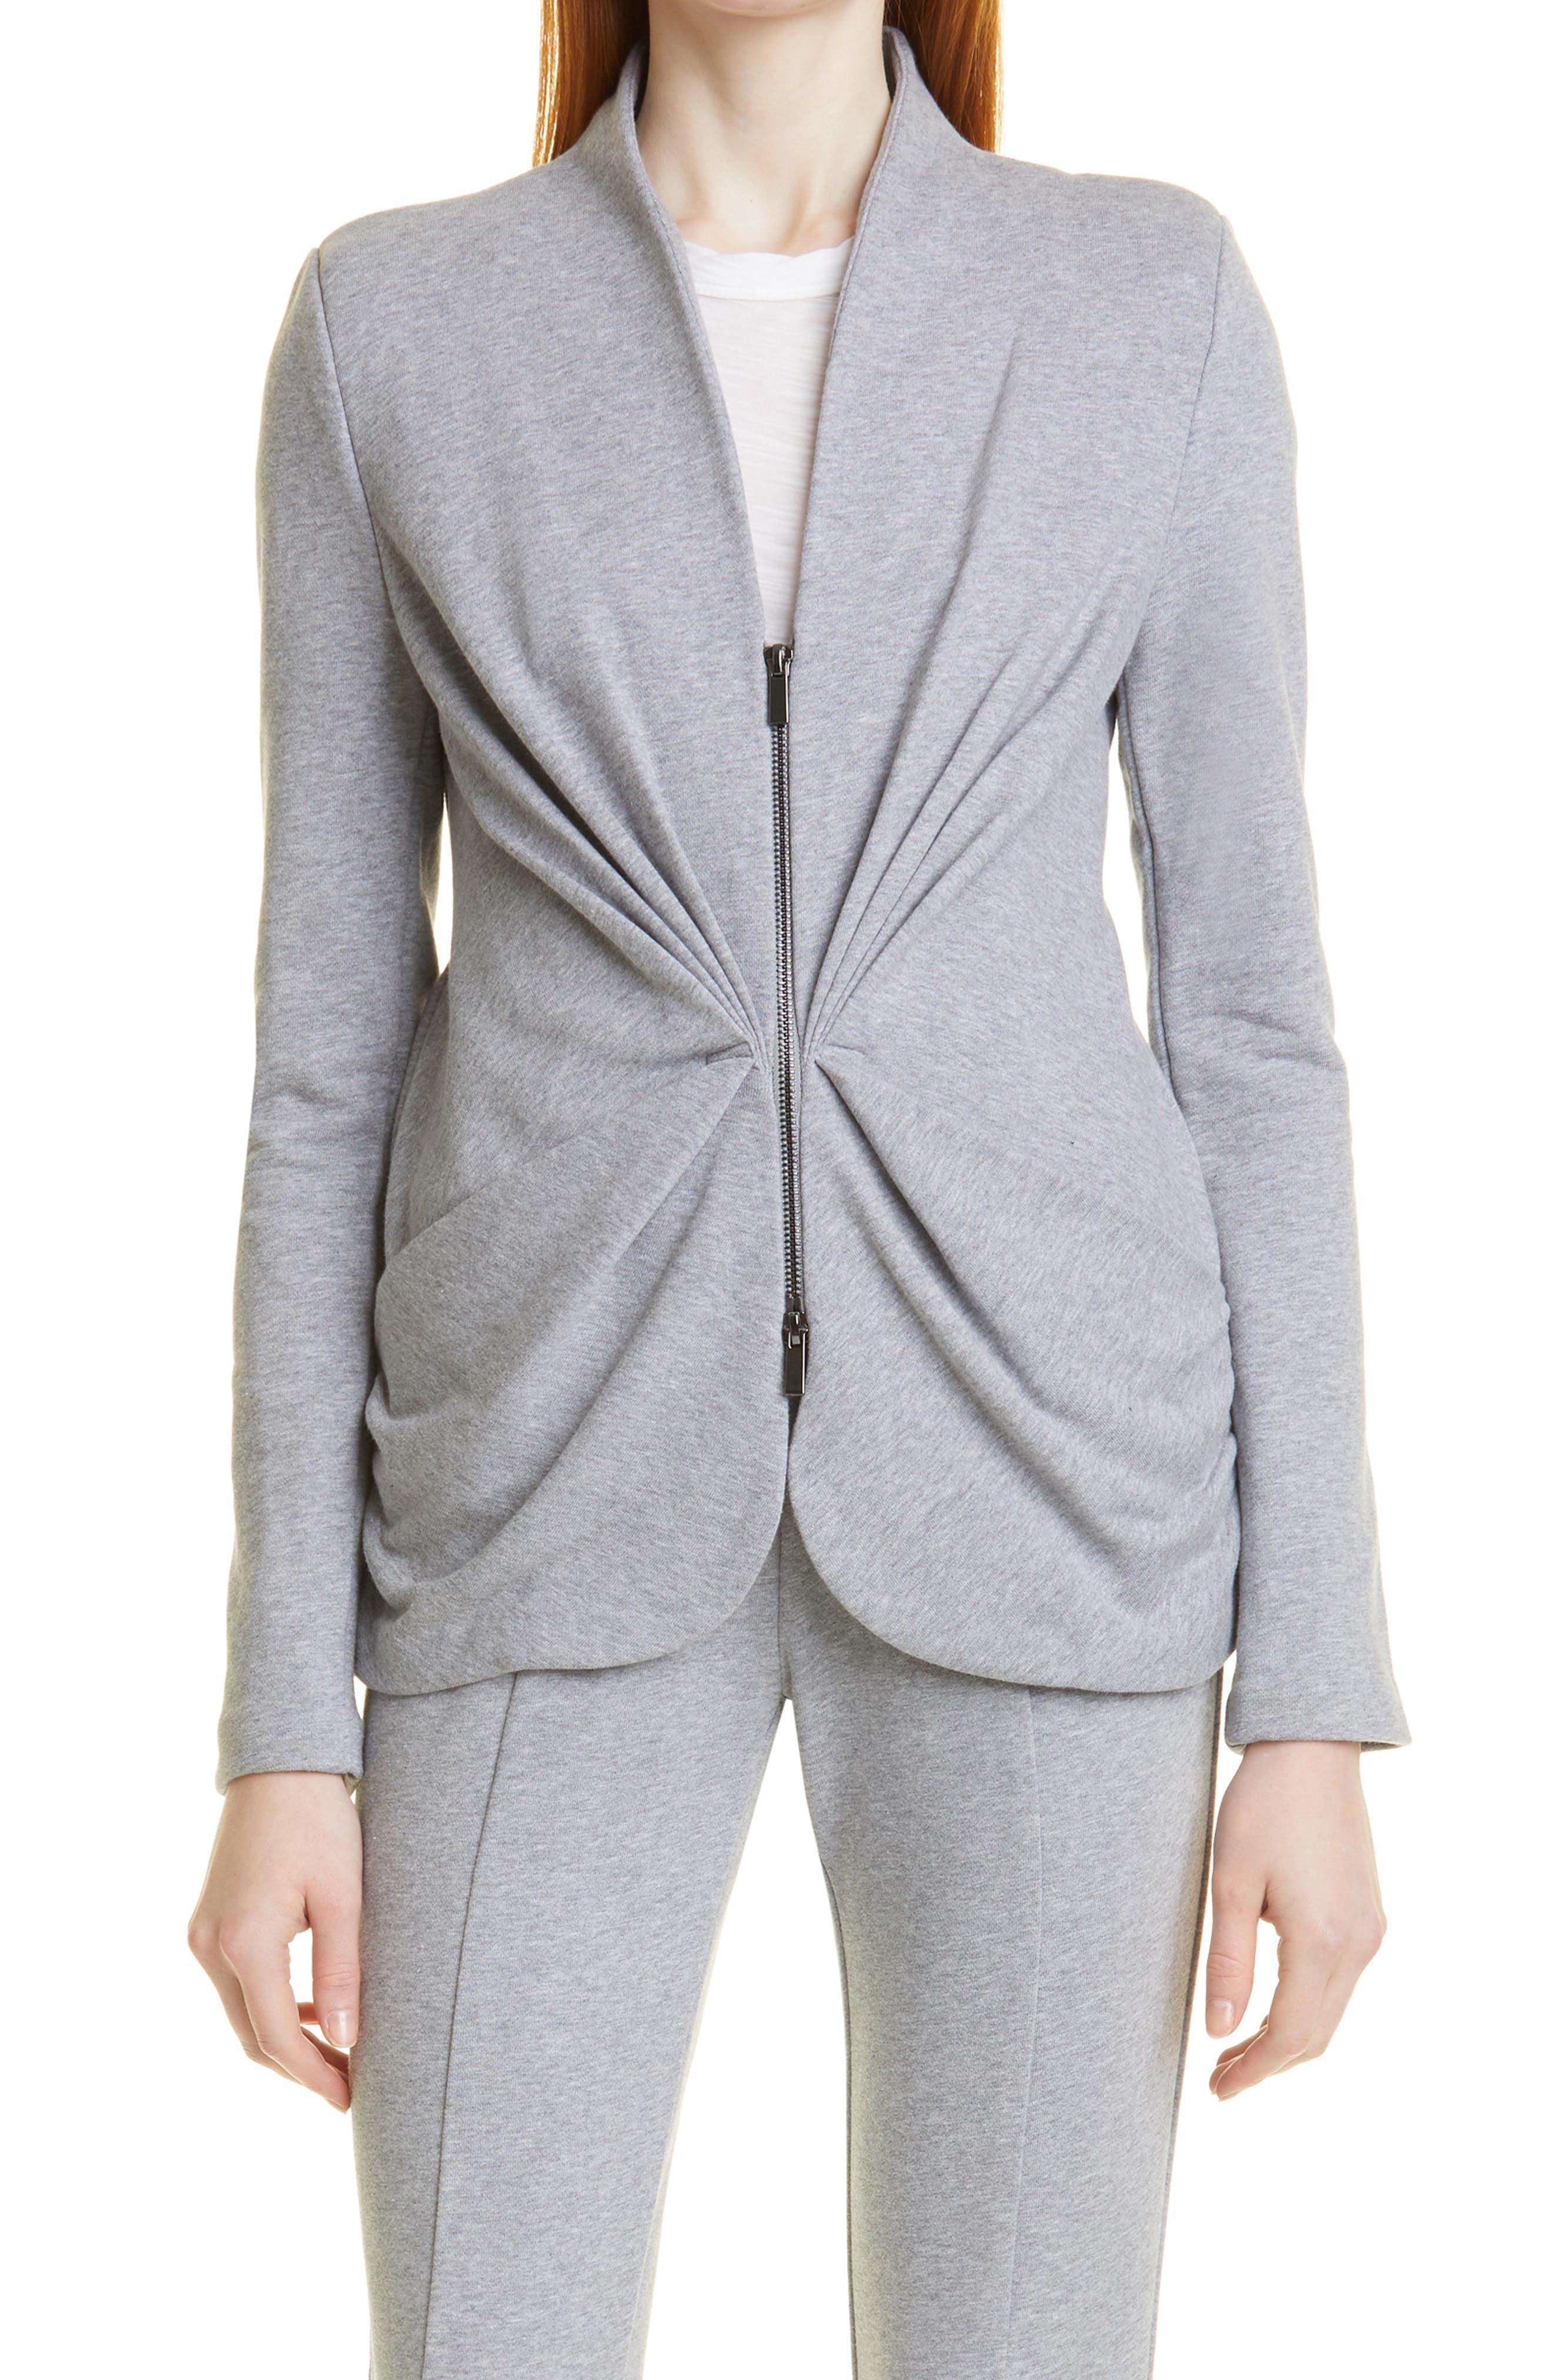 Starburst Zip Front Cotton Knit Jacket